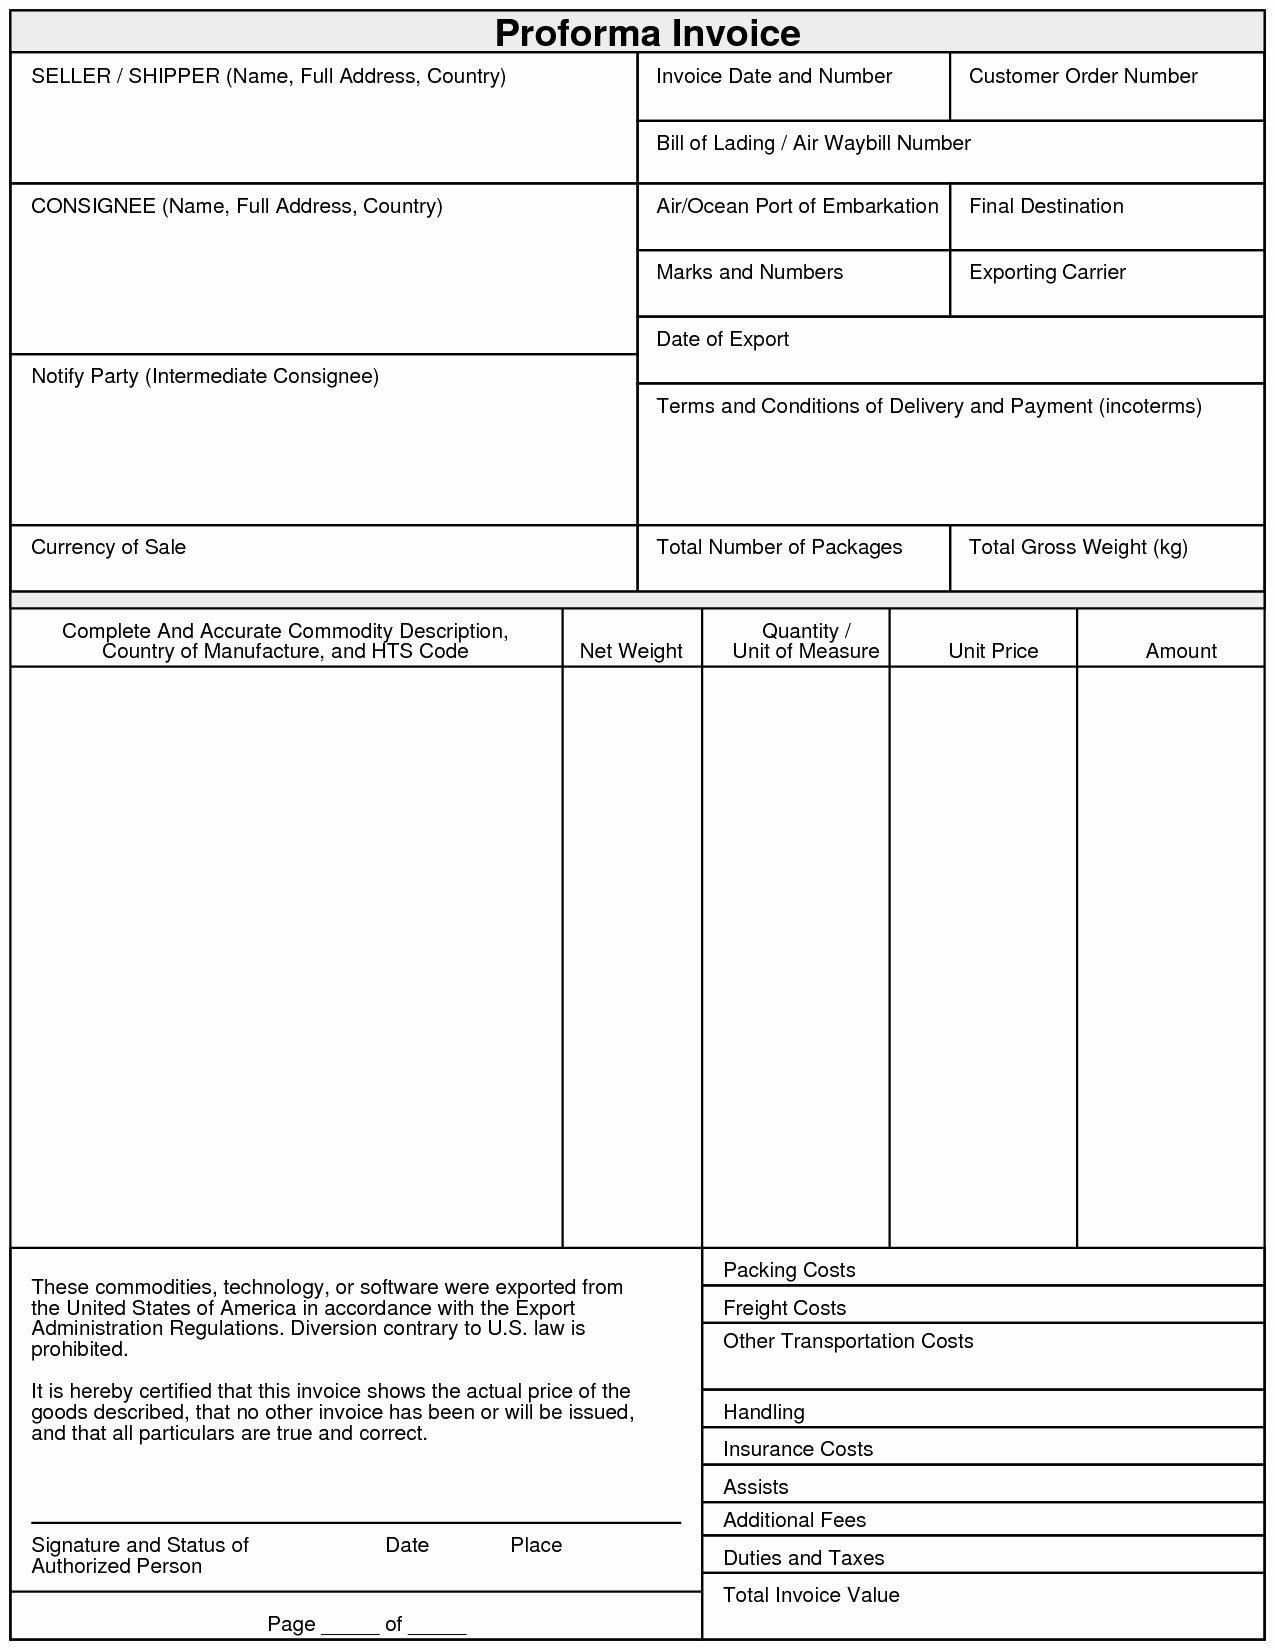 Proforma Invoice Template Excel Elegant Proforma Invoice Template Pdf